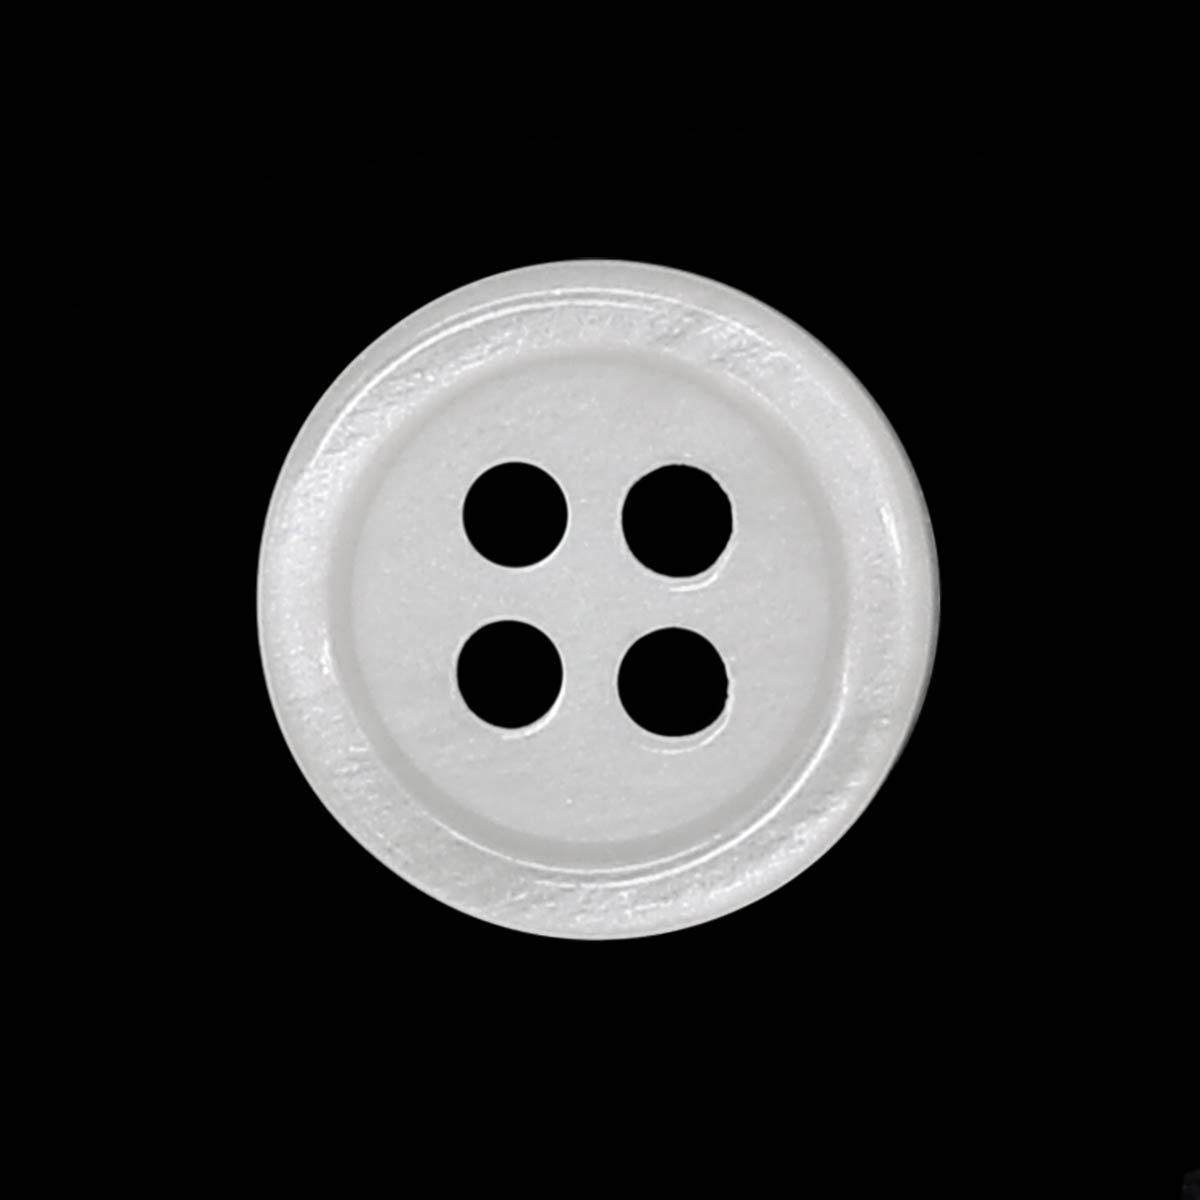 35483/4 18 (3512) Пуговица 4прокола бел.глянц.полиэстер ГР